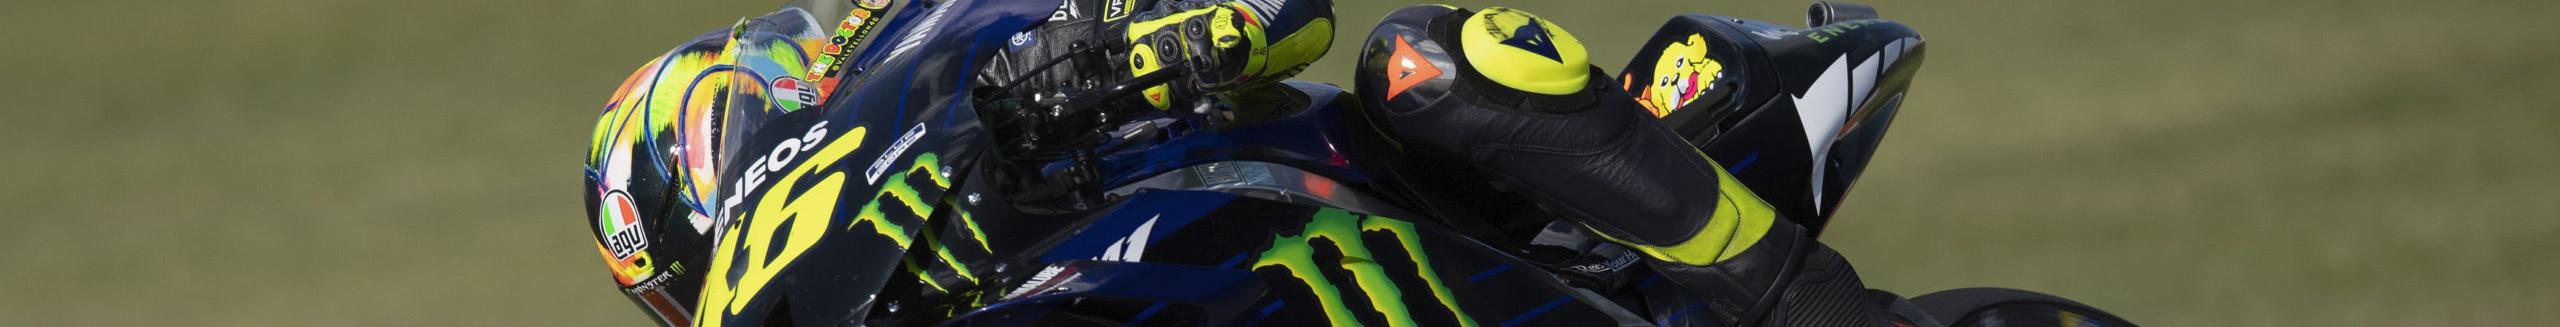 eMOTO GP: Με Βαλεντίνο Ρόσι στη Red Bull Ring!